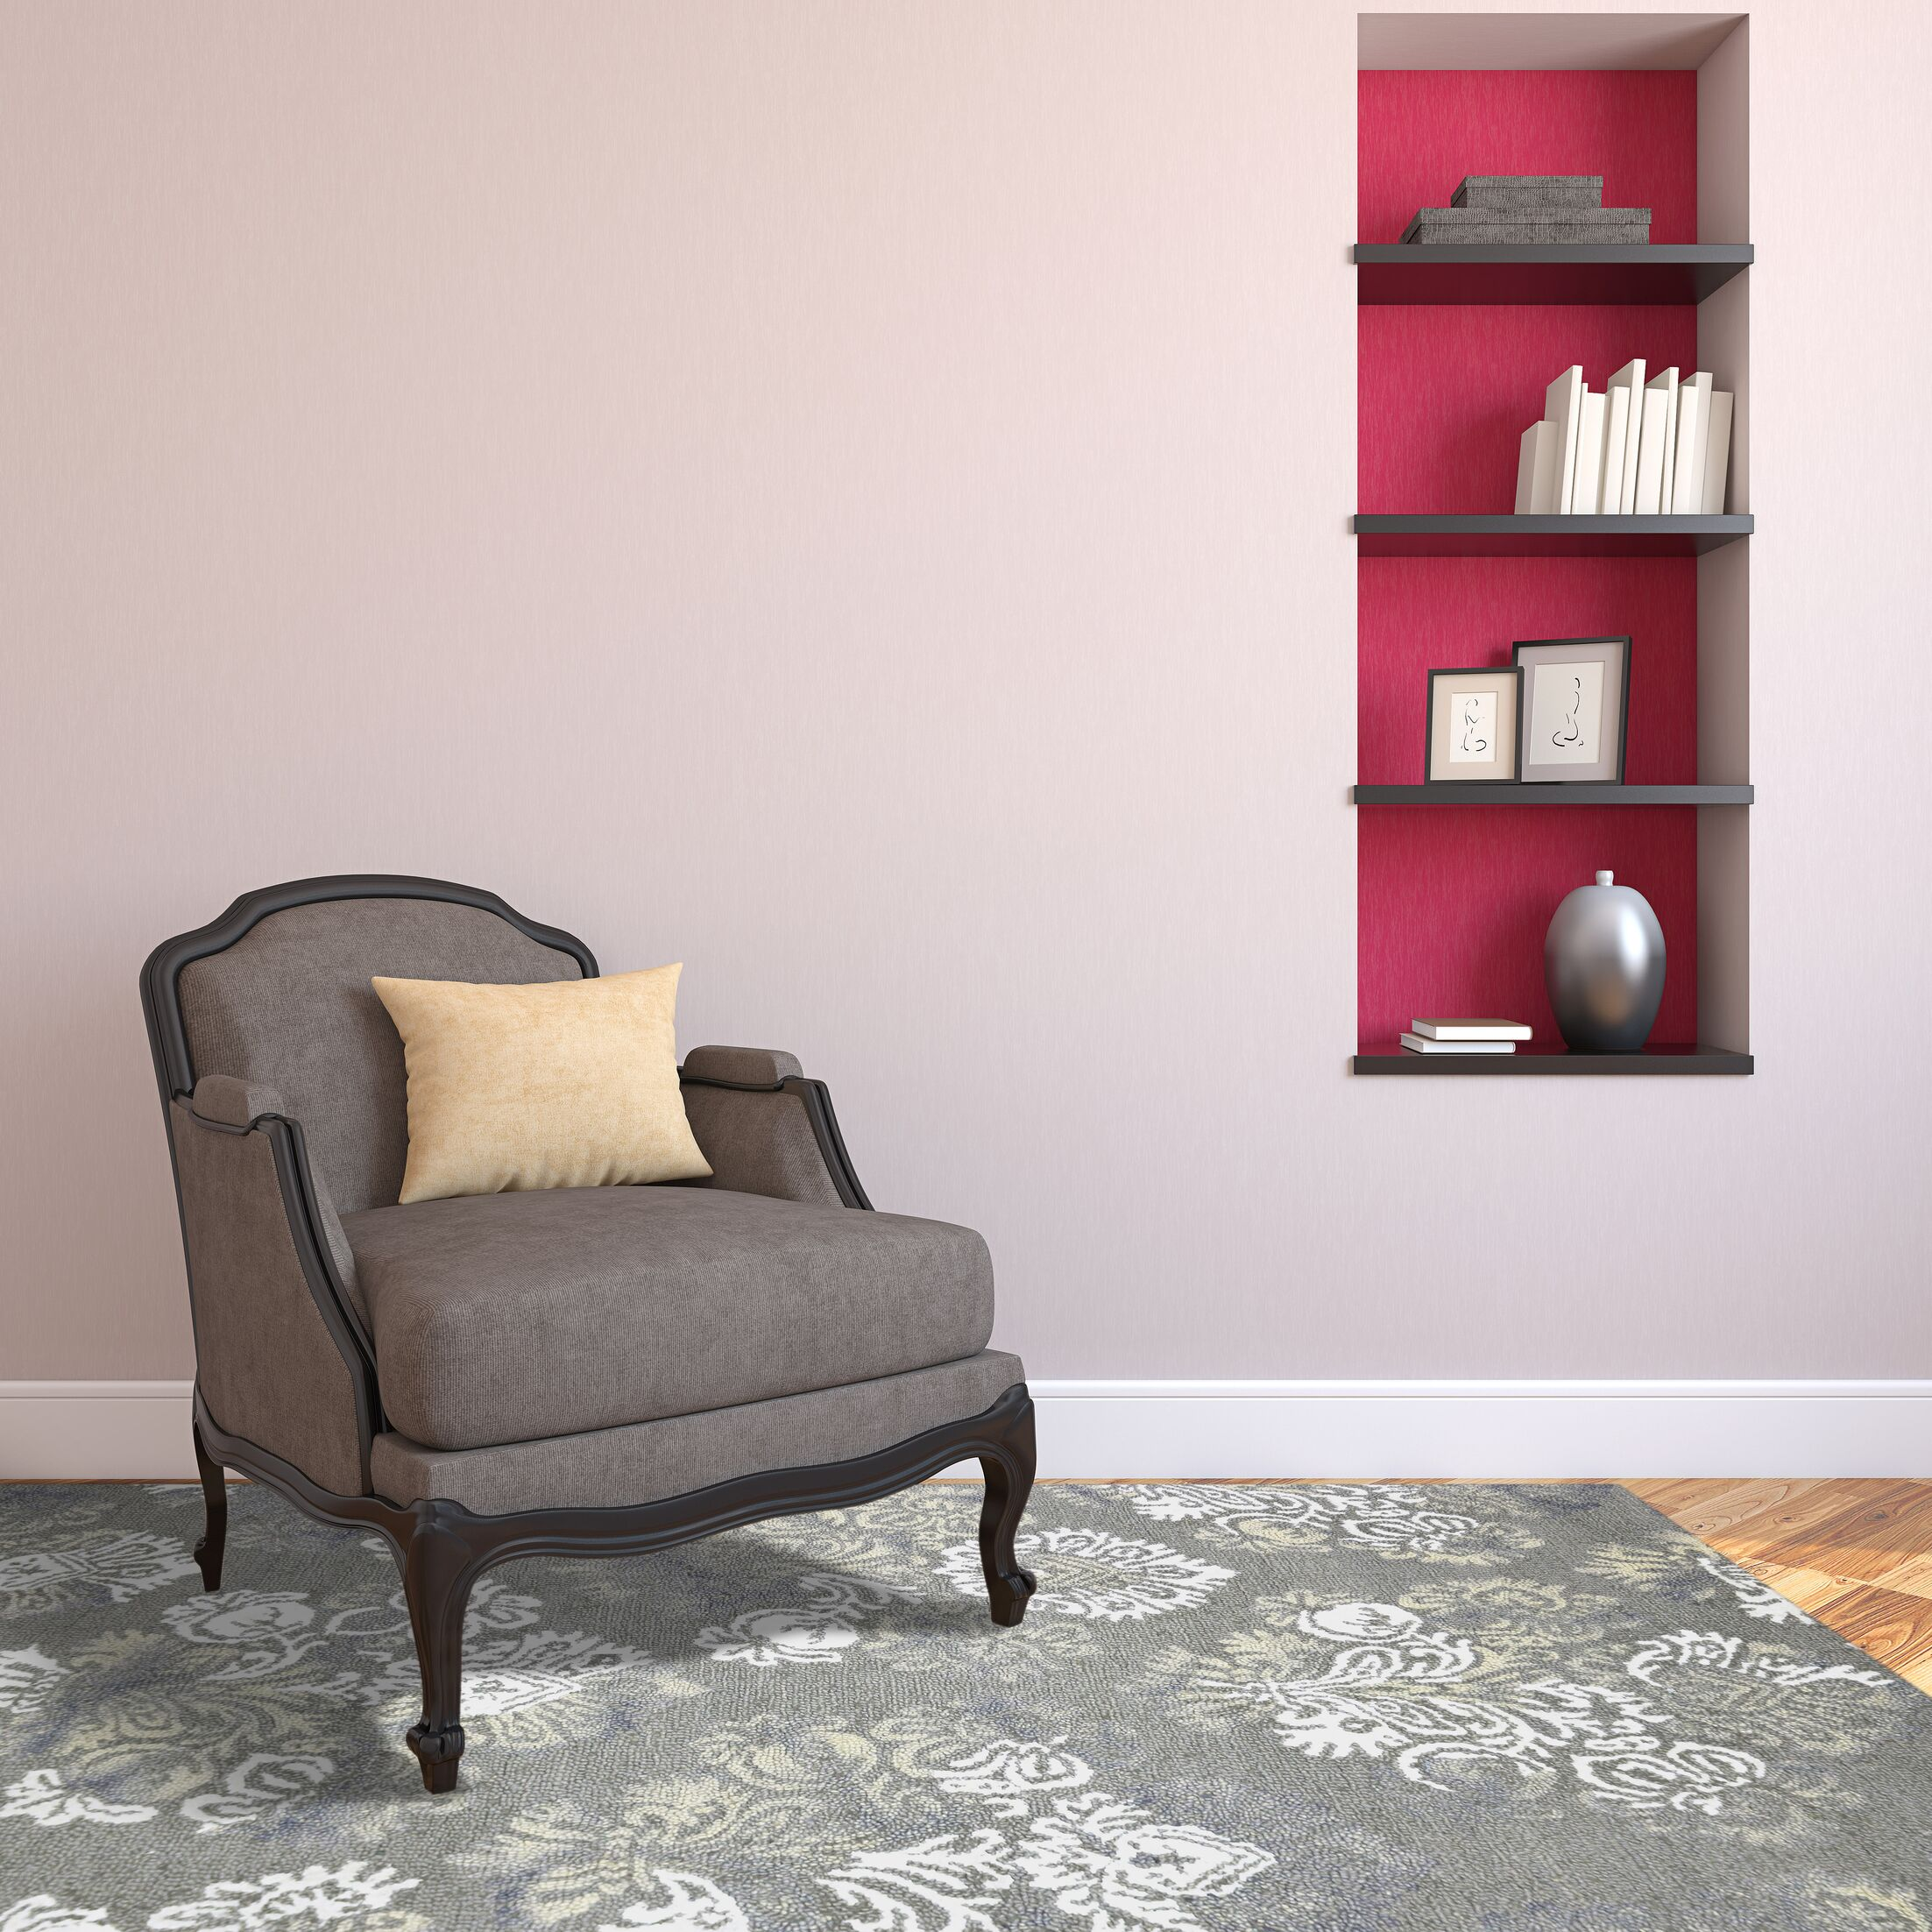 Averi Hand-Tufted Handmade Silver Area Rug Rug Size: 8' x 11'